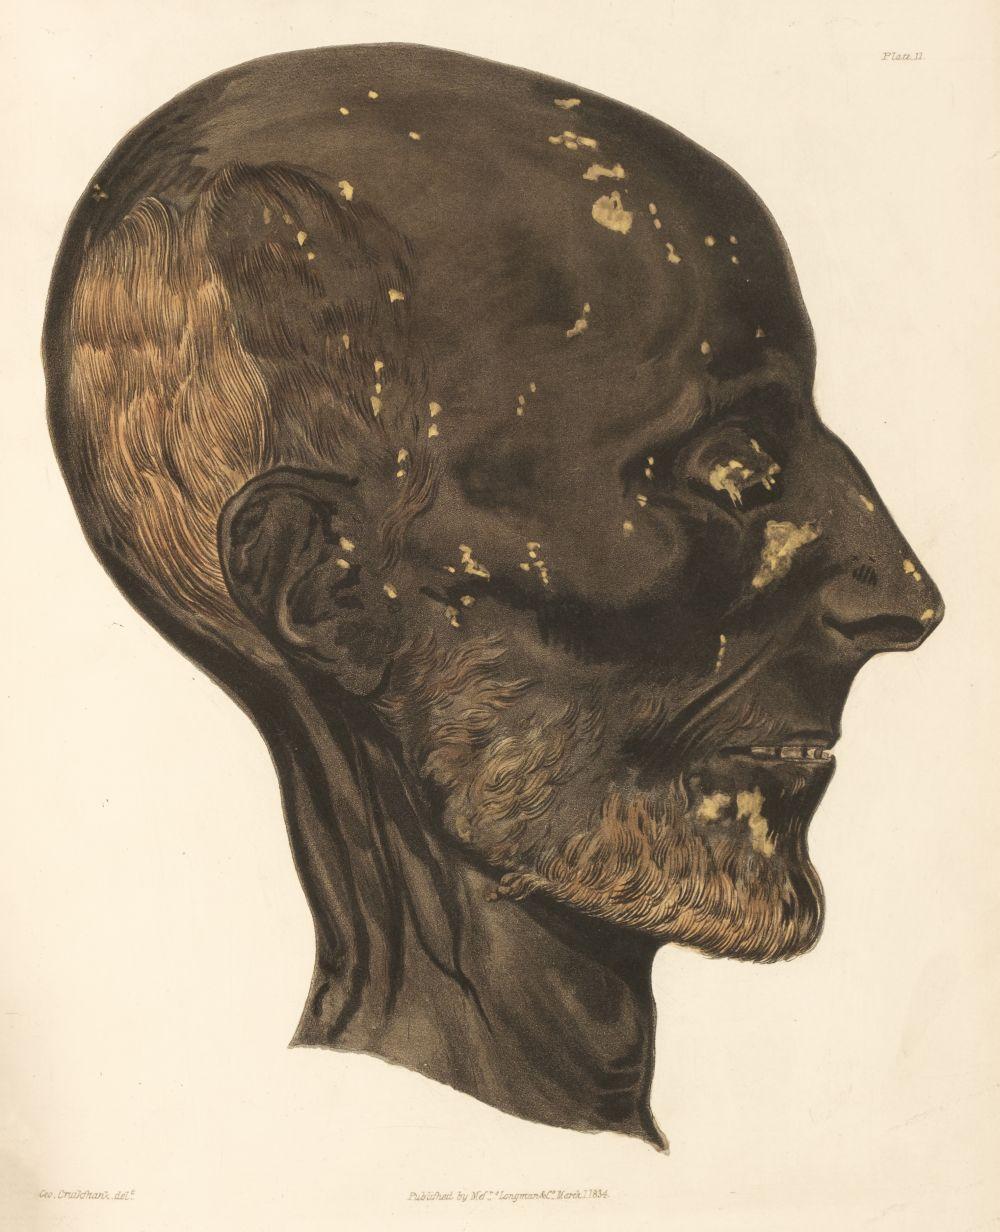 Pettigrew, Thomas Joseph. A History of Egyptian Mummies